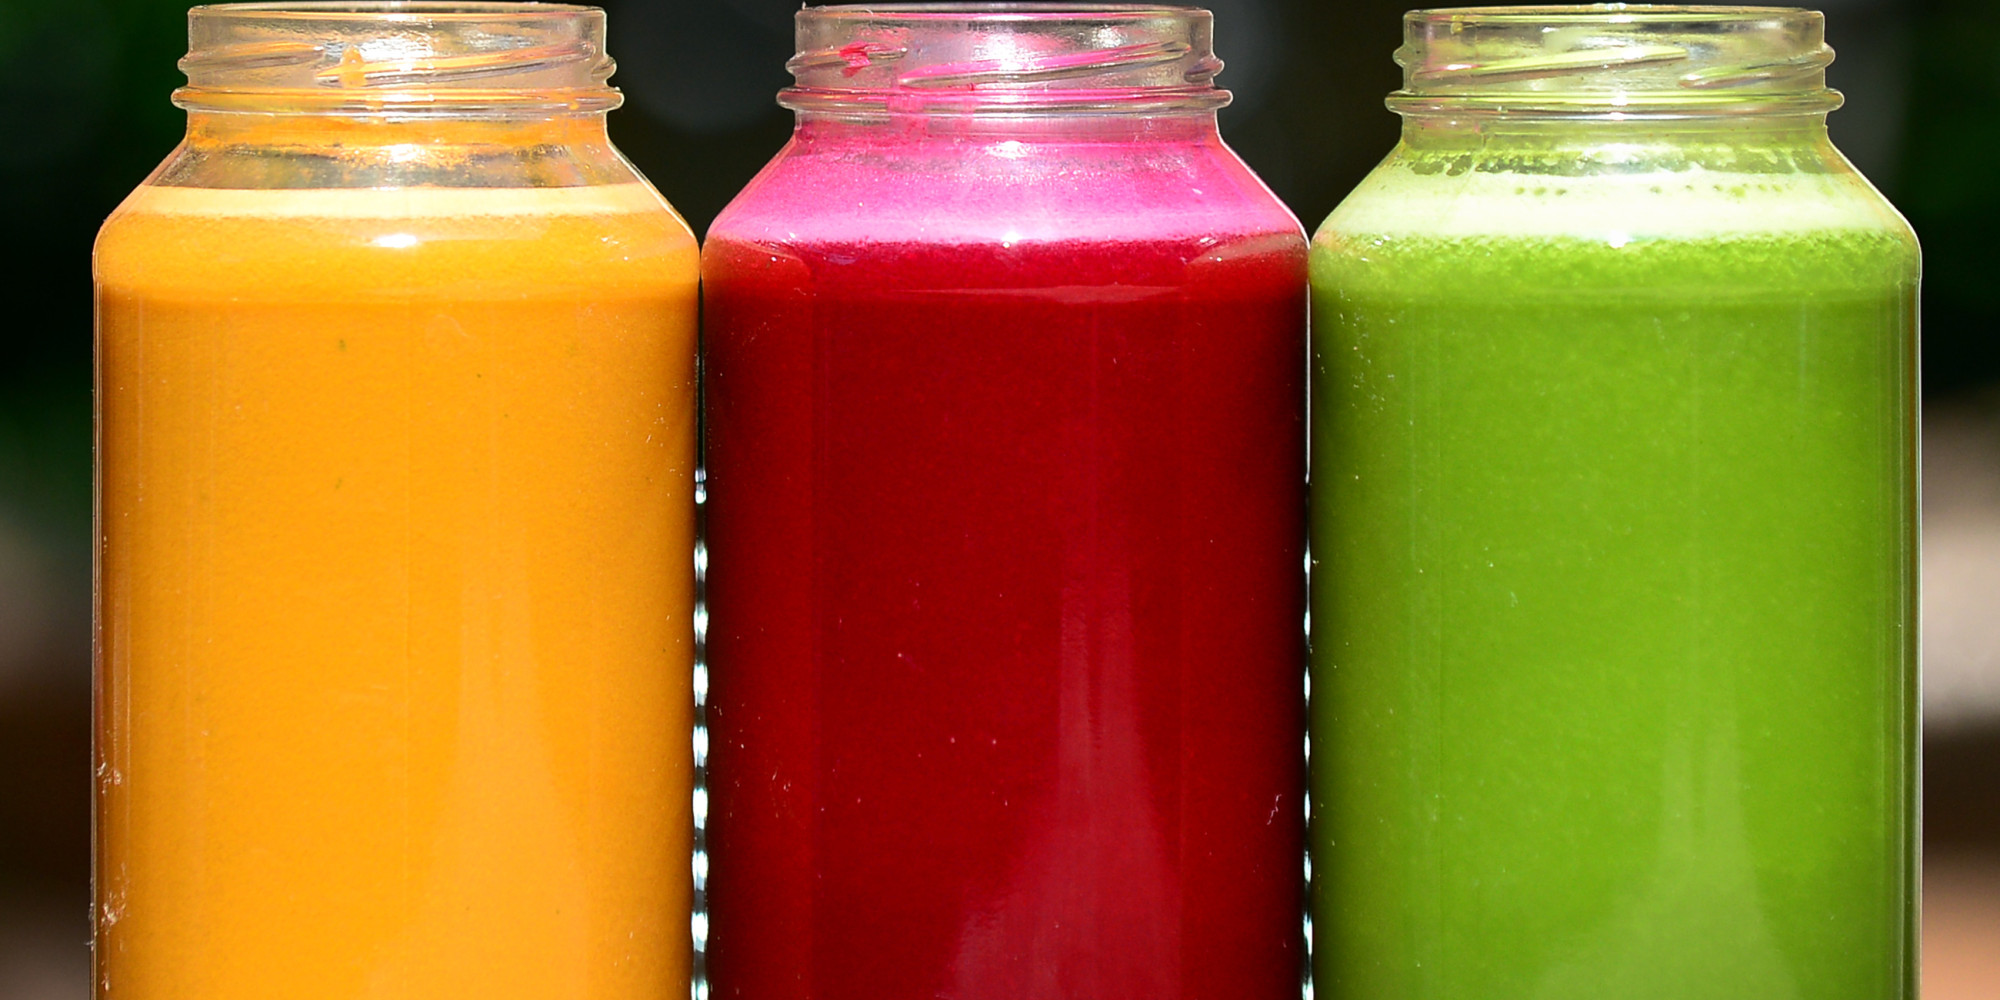 The Unbelievable Amount Of Sugar In 'Healthy' Juice